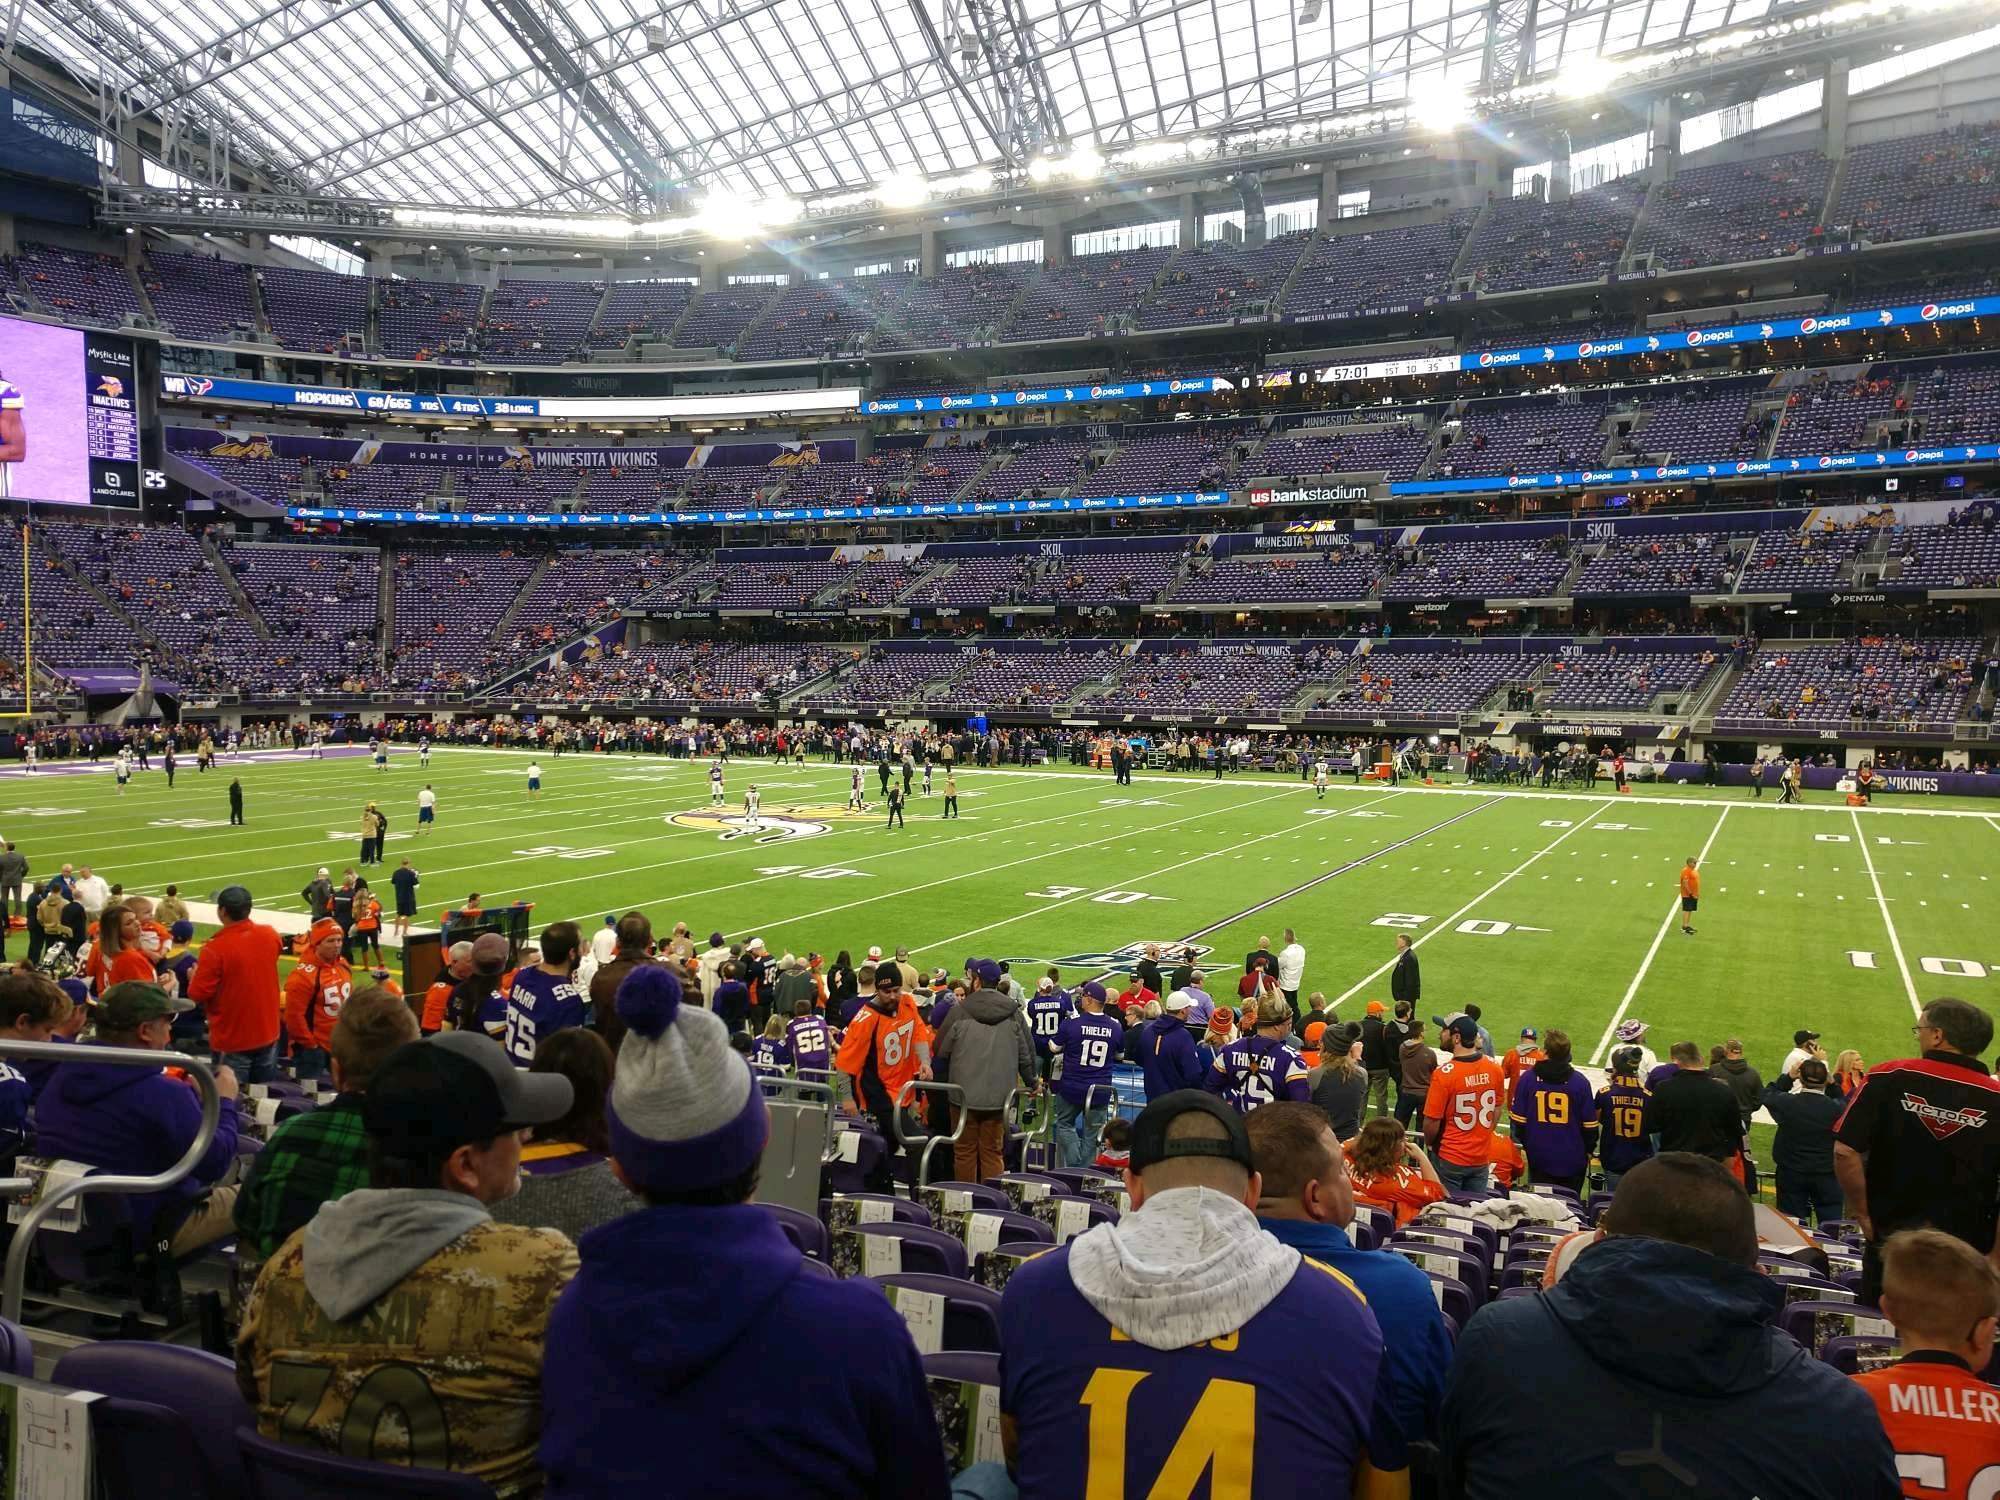 U.S. Bank Stadium Section 106 Row 14 Seat 17